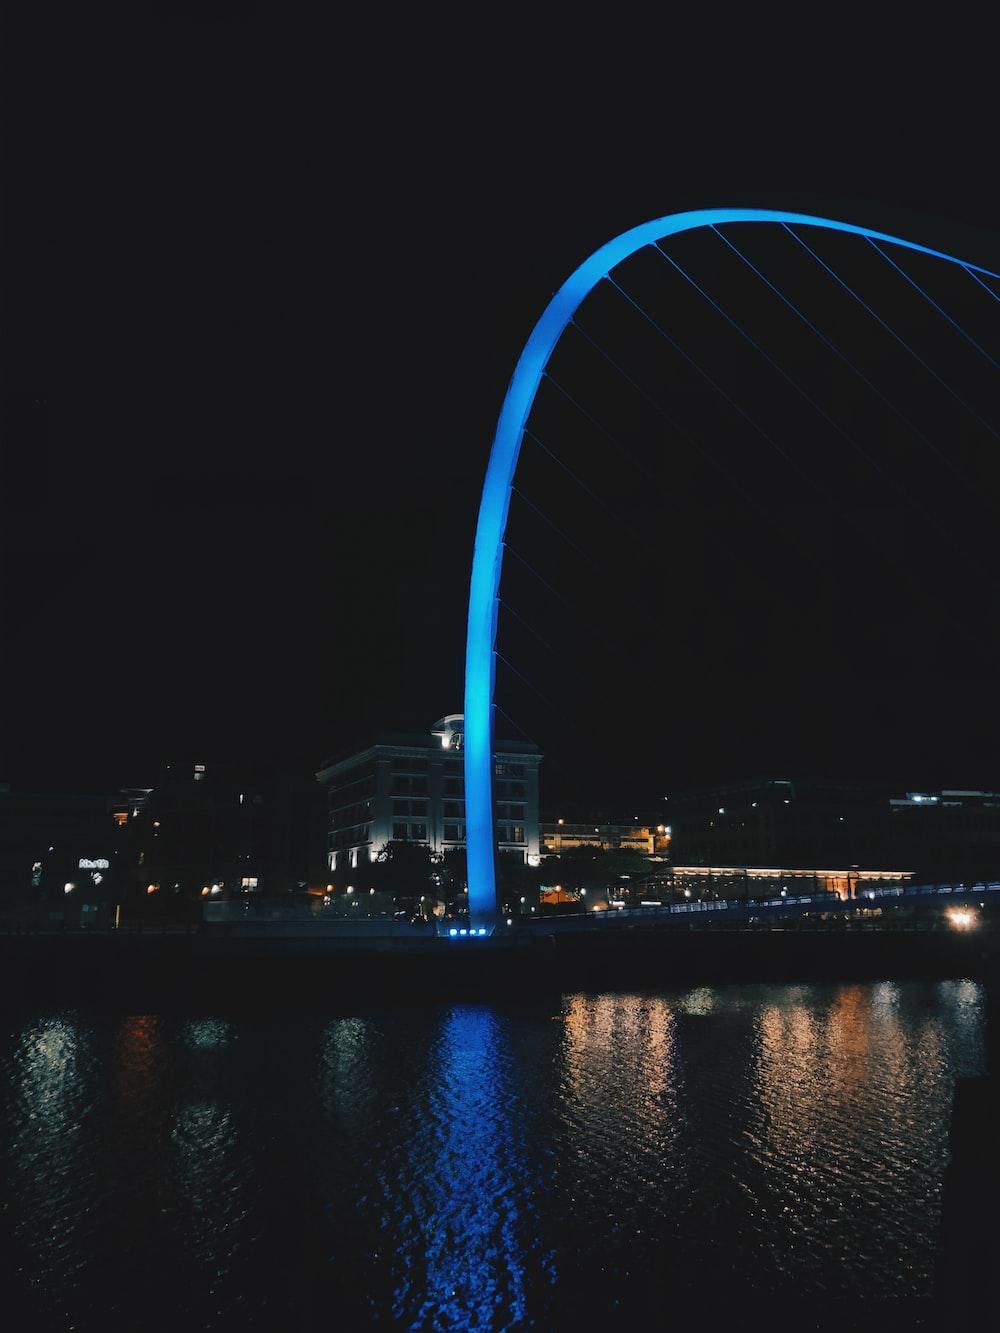 blue-lighted landmarj at night